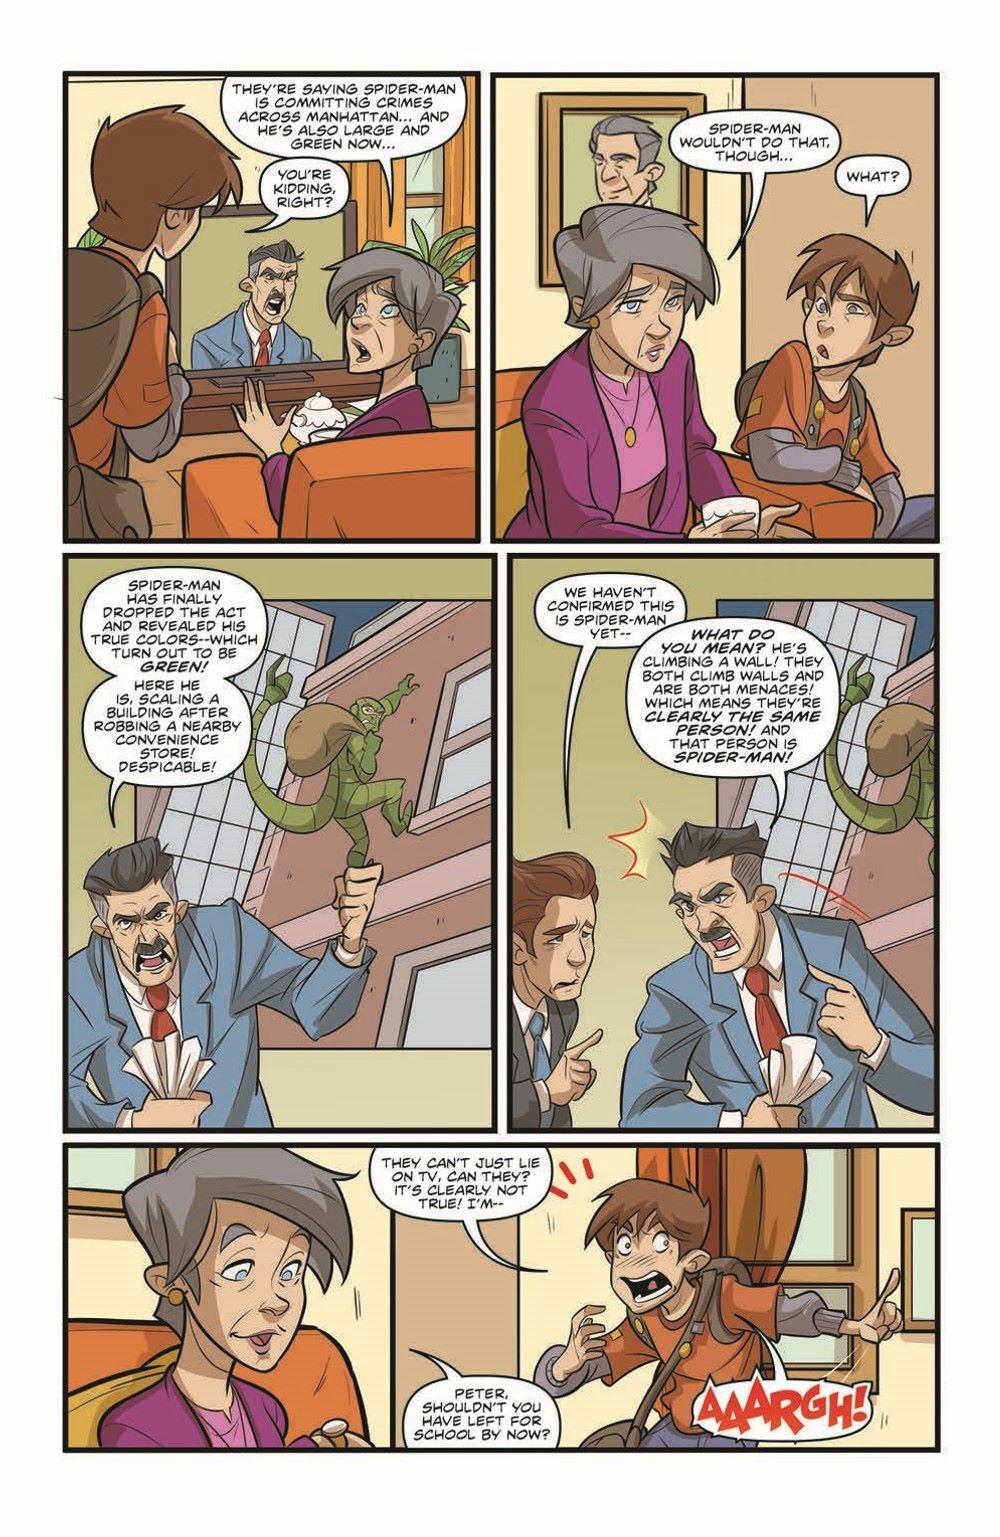 SpidermanV3-02_pr-4 ComicList Previews: MARVEL ACTION SPIDER-MAN VOLUME 3 #2